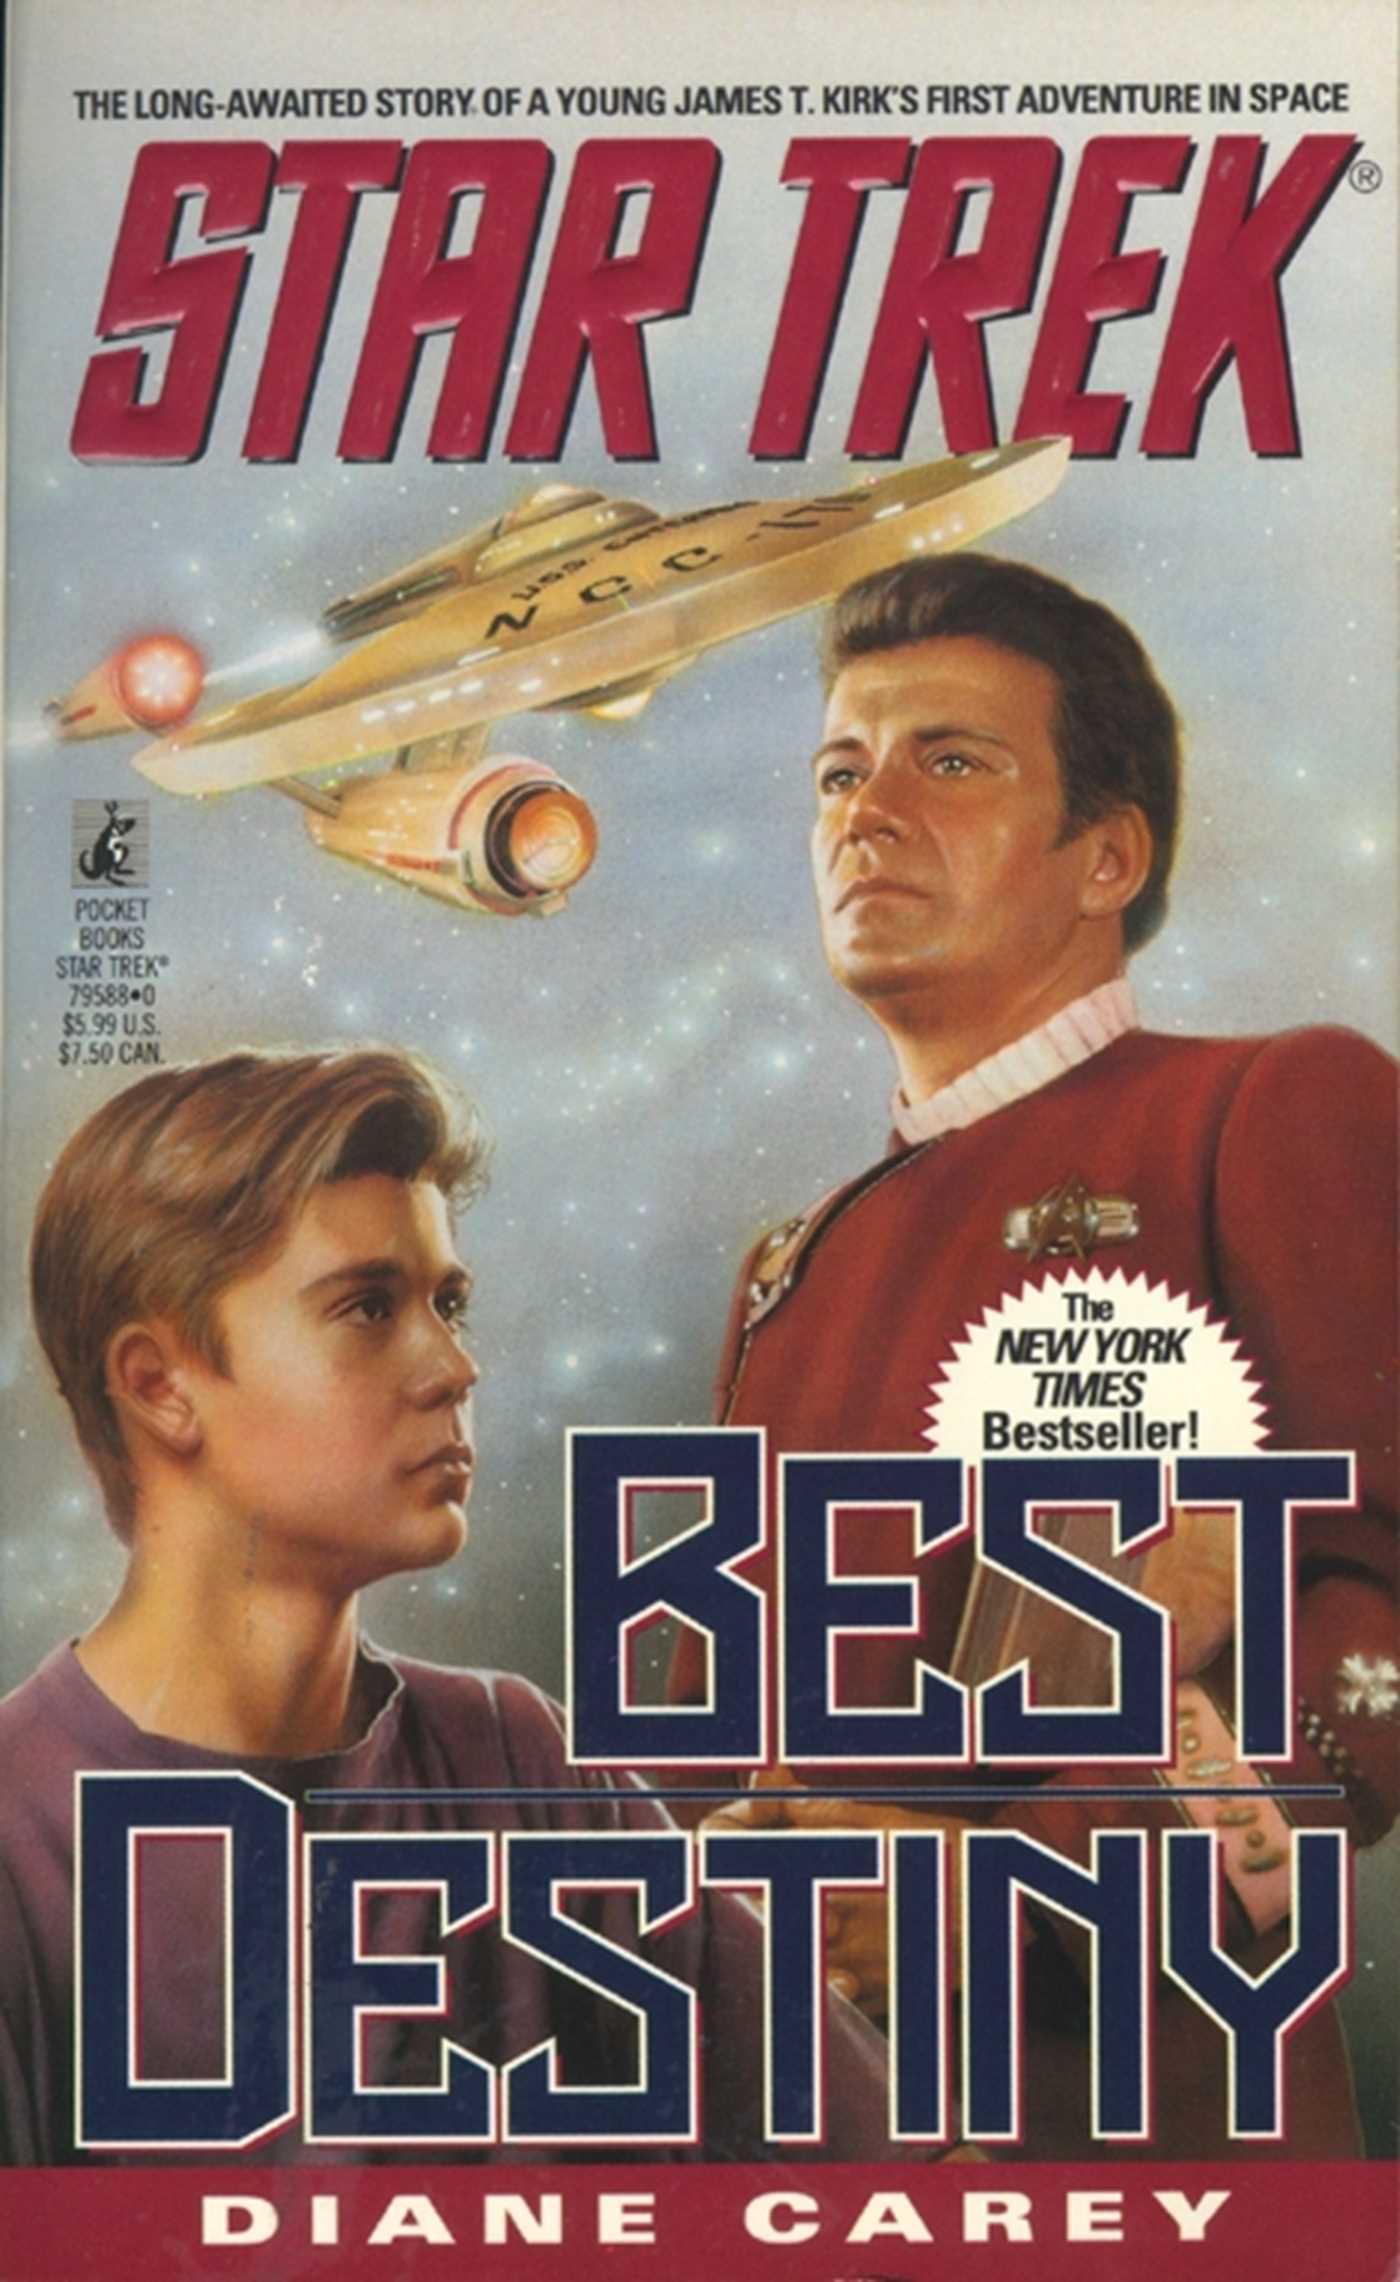 Star trek best destiny 9780671041113 hr